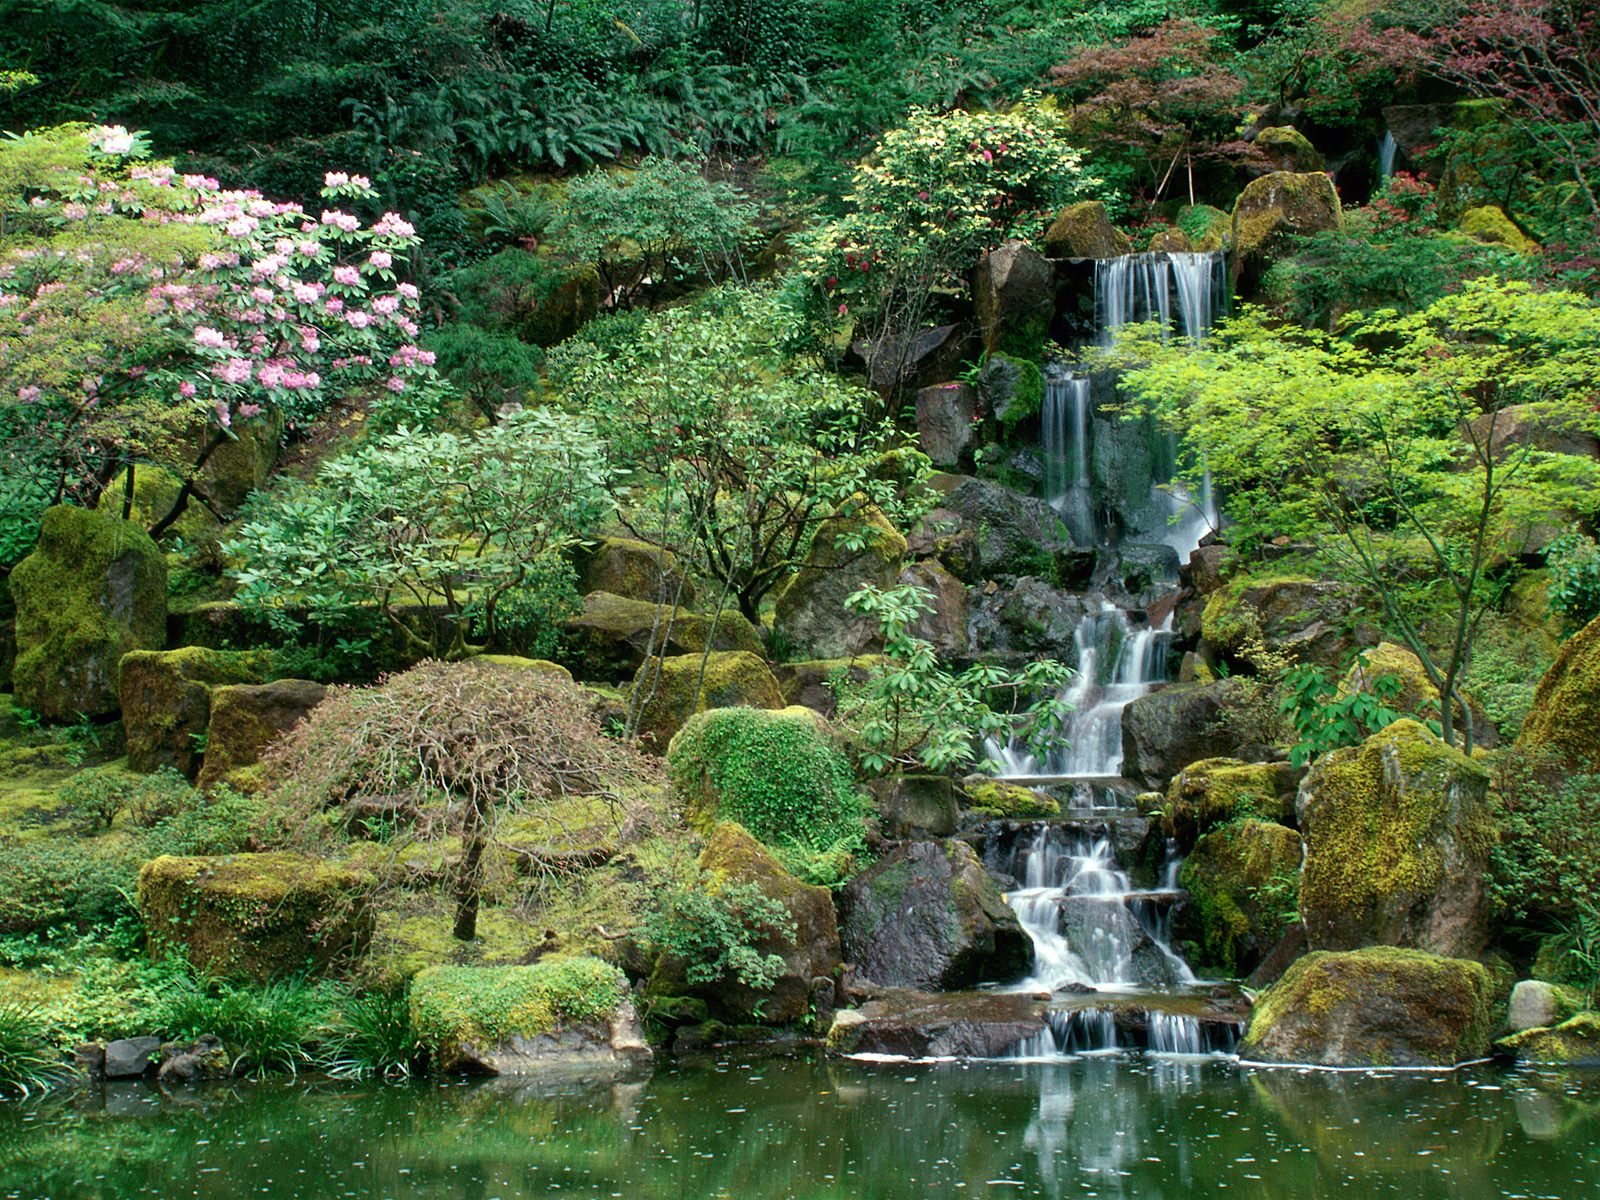 Natural Japanese Modern Landscape Paysages Printemps Et